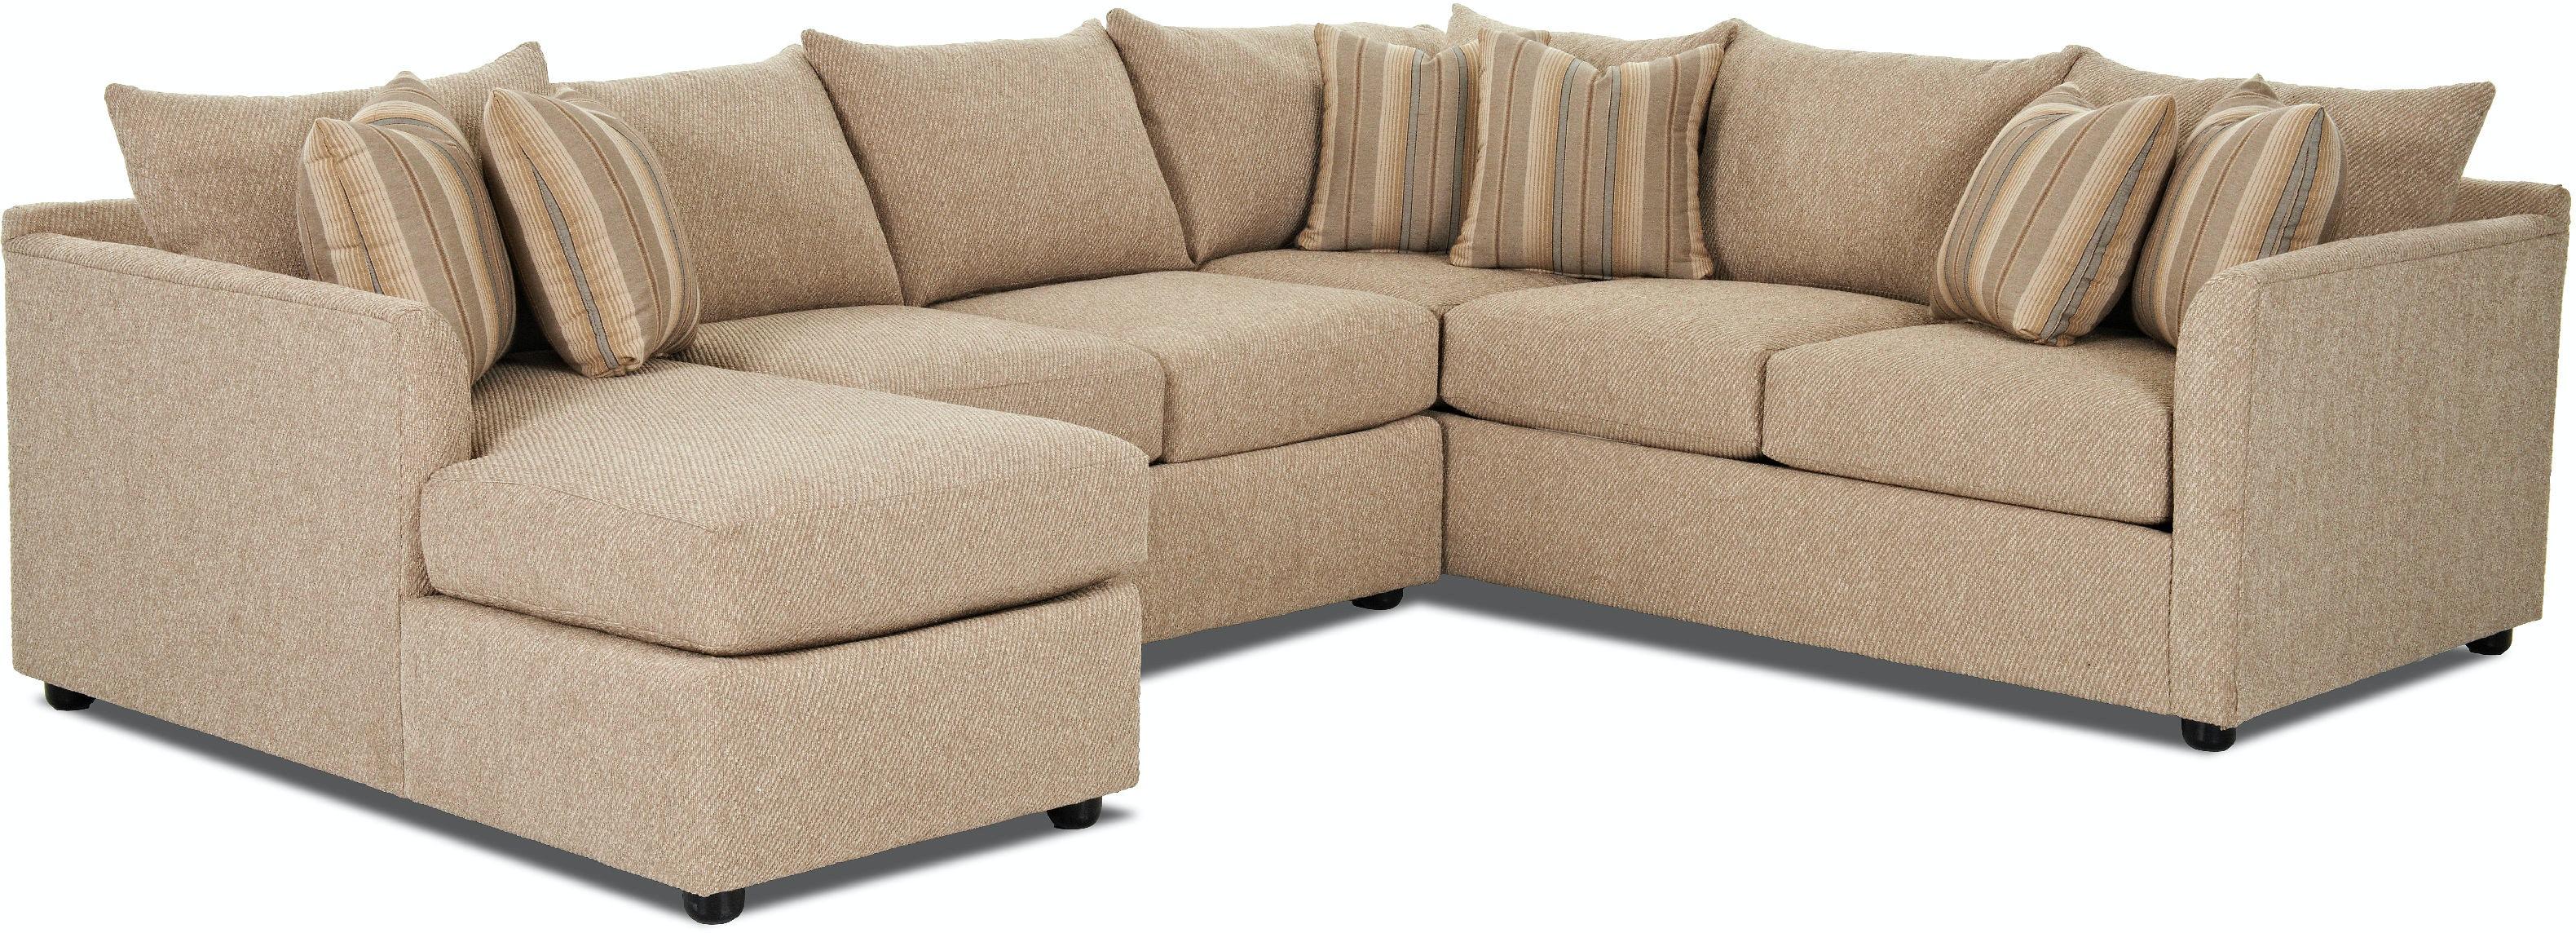 Furniture Village Atlanta klaussner living room atlanta sectional k27800l s - smith village